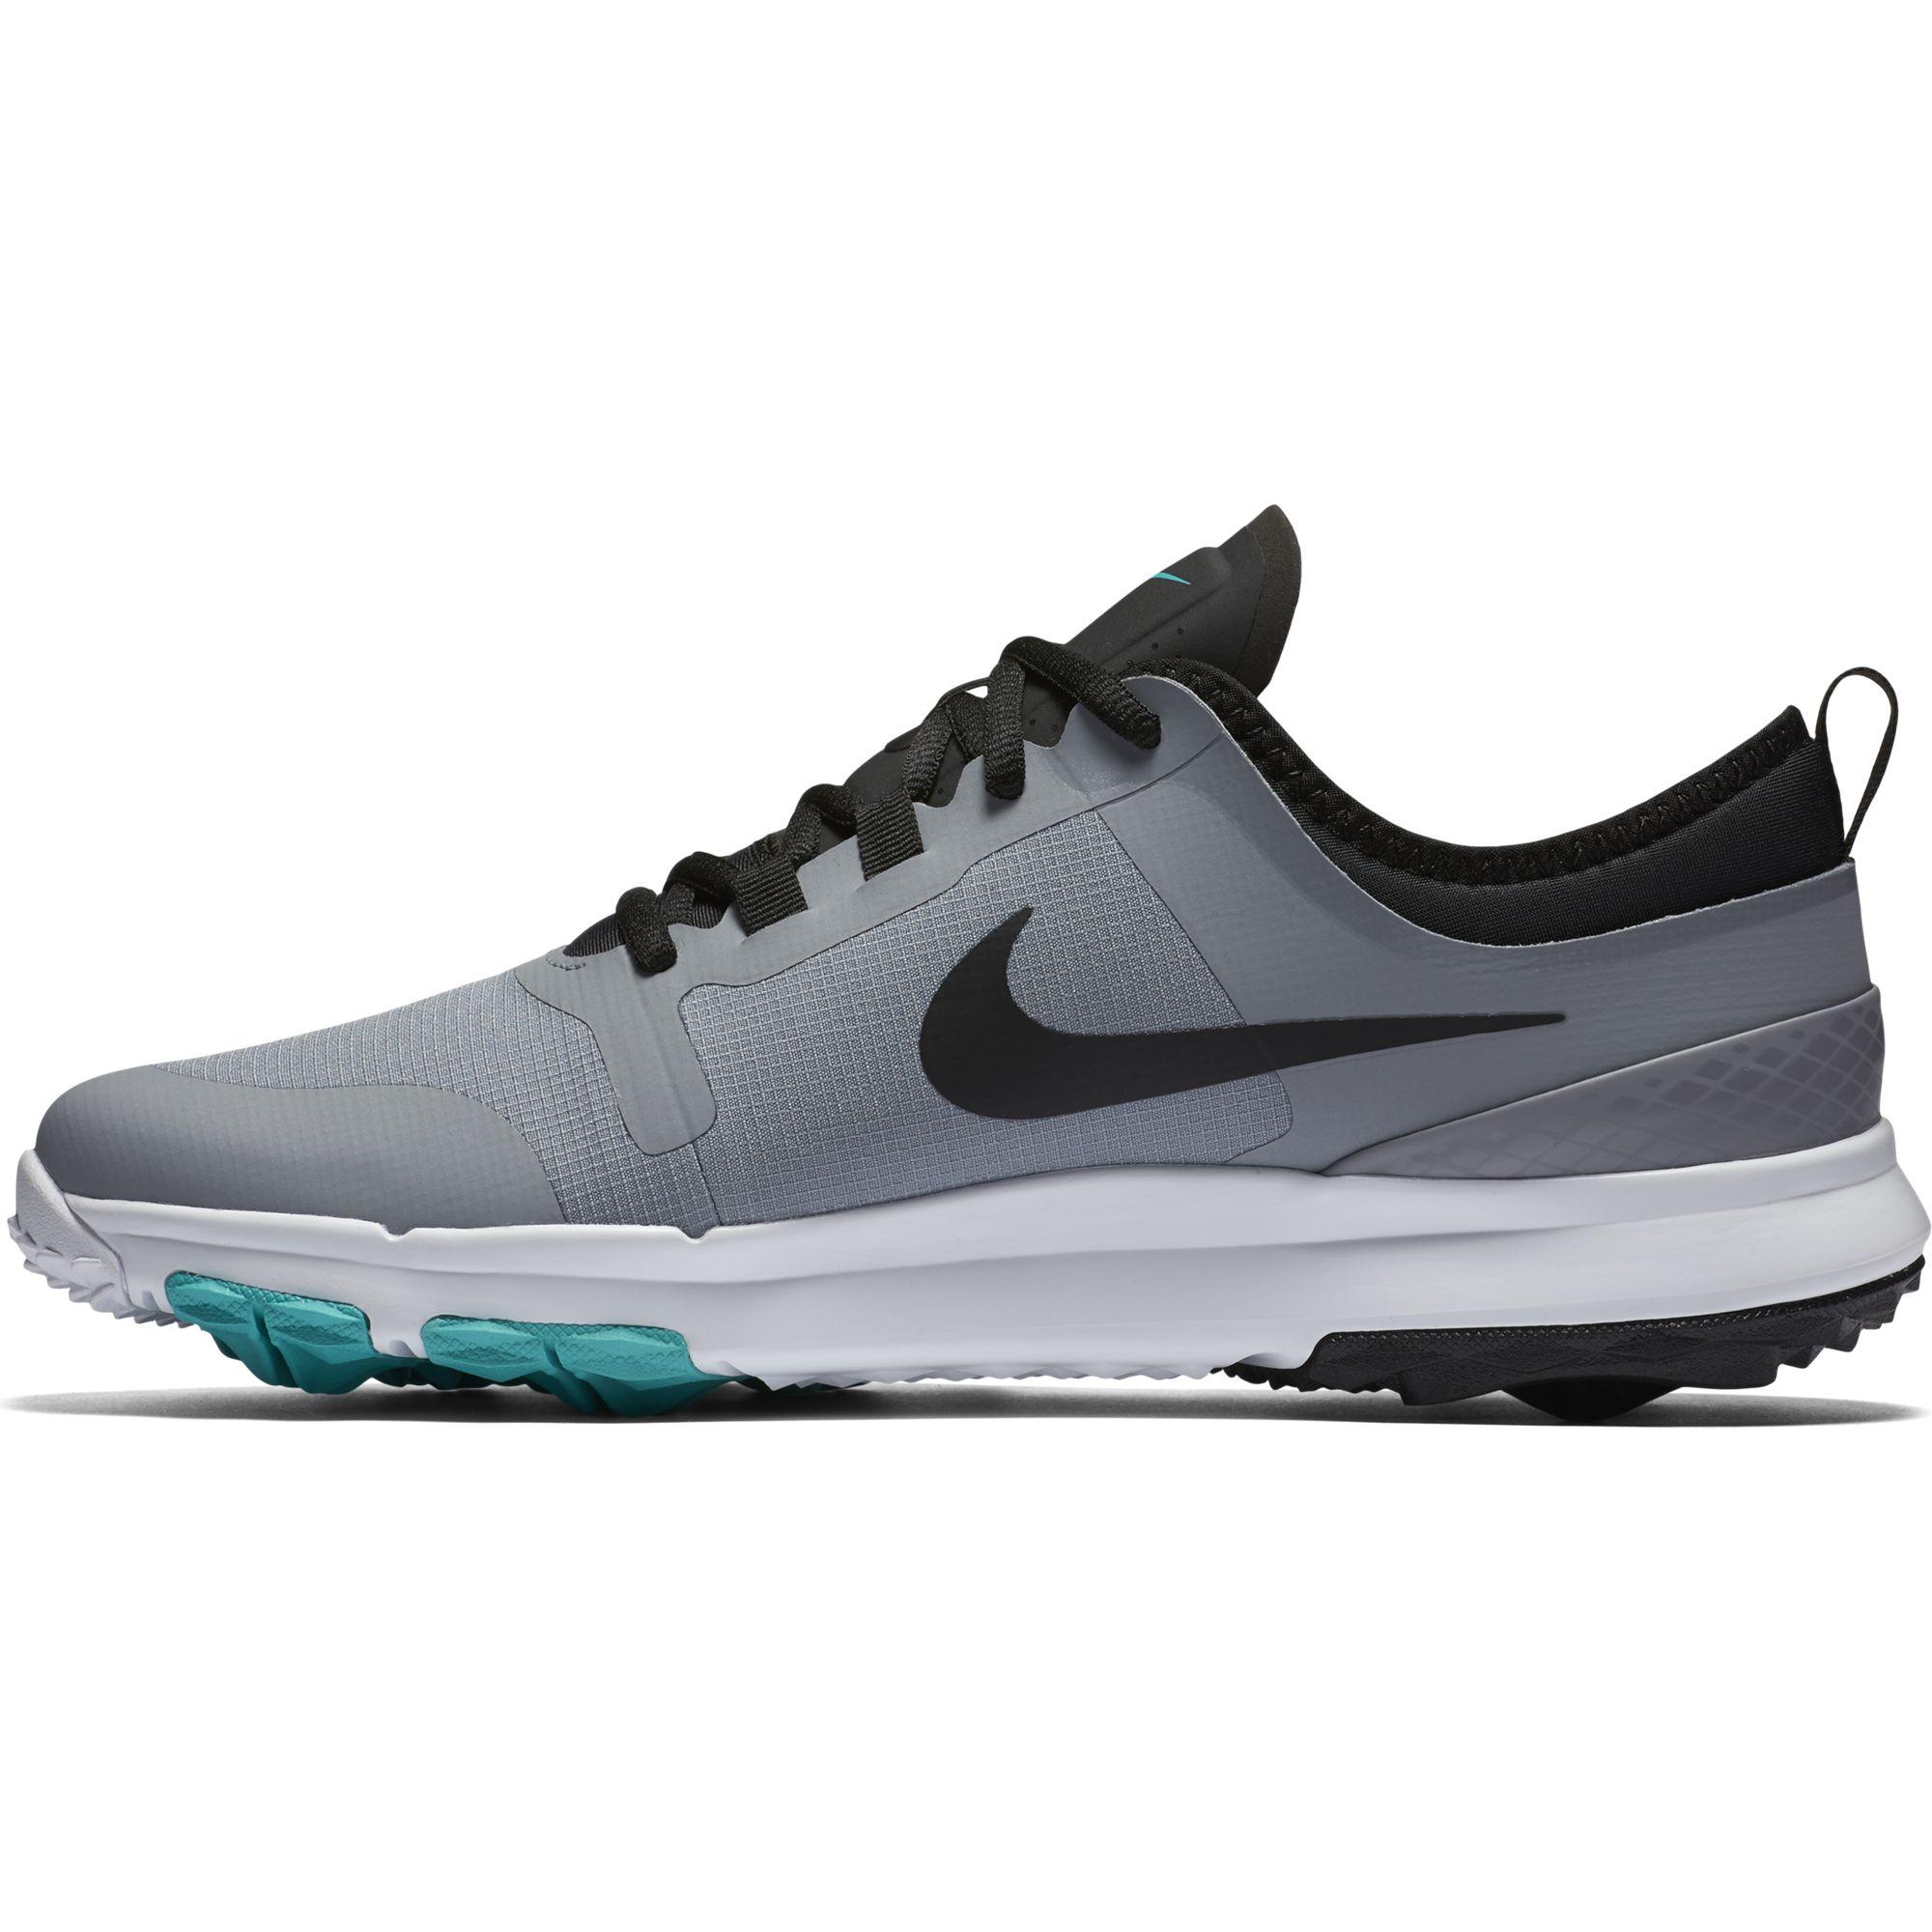 Nike Fi Impact Spikeless Golf Shoes